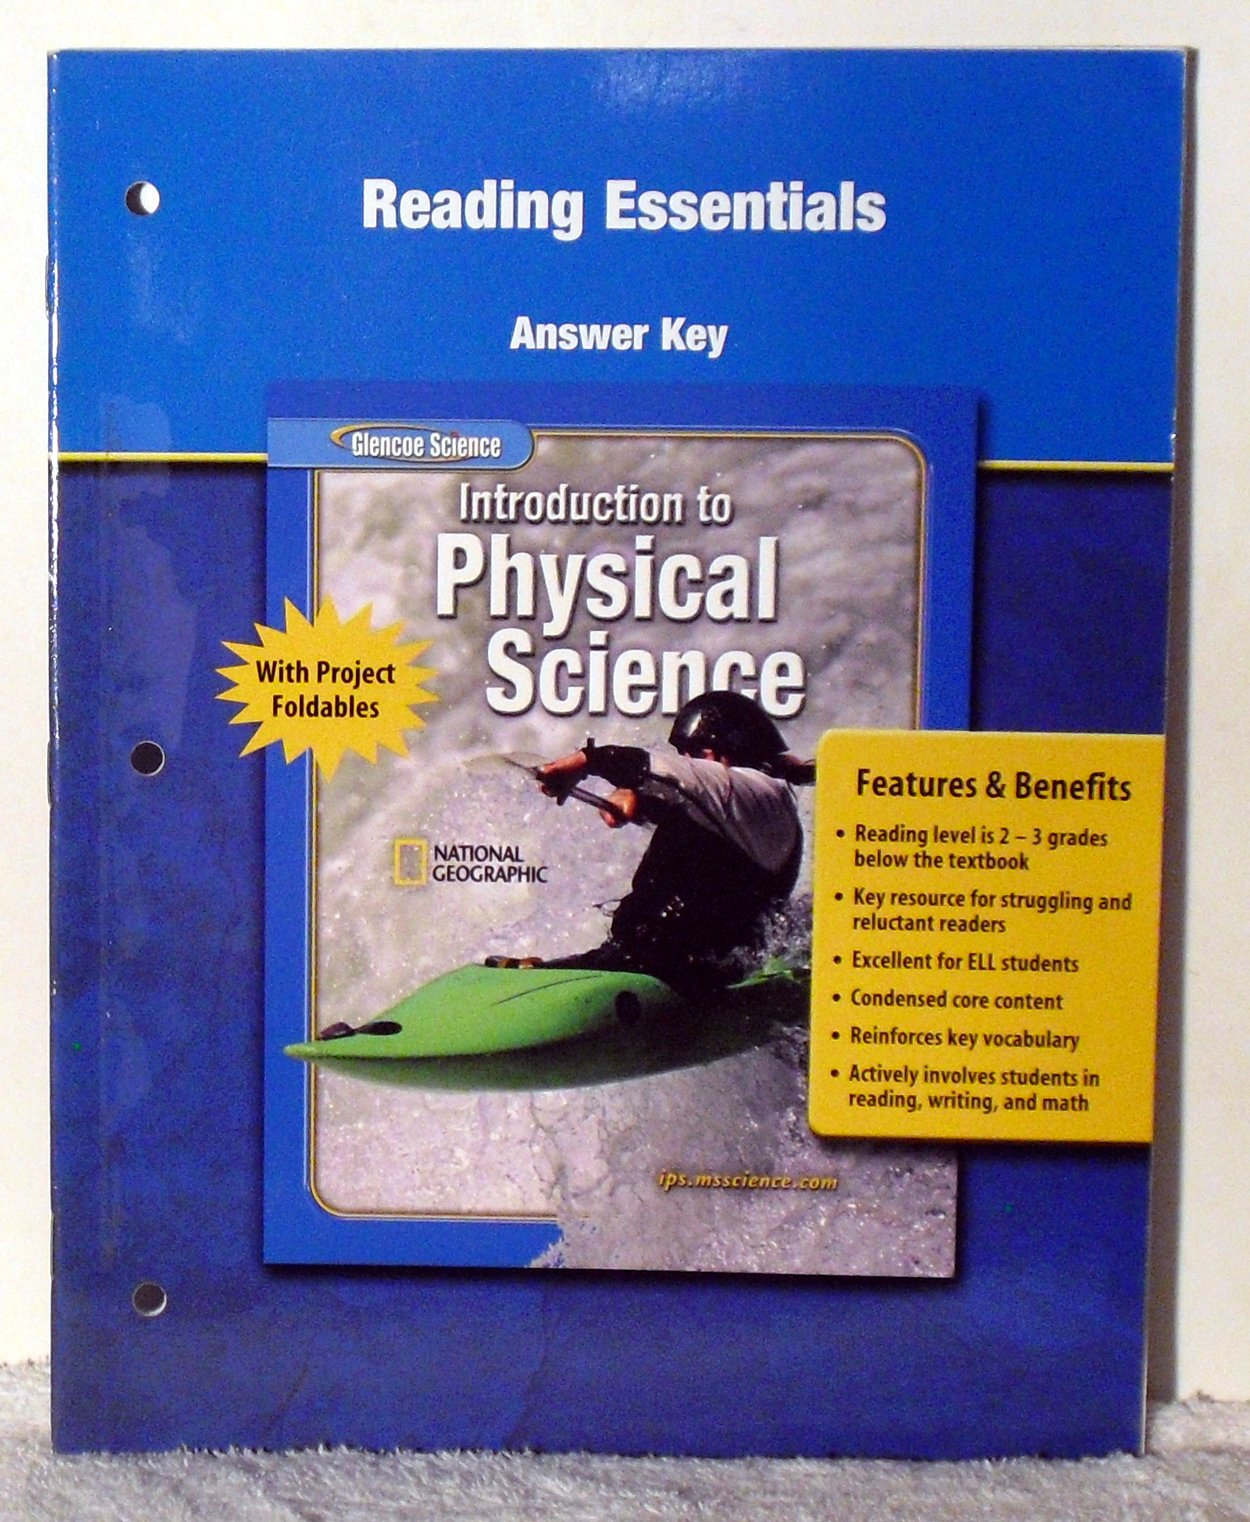 Physical Science Textbook Answer Key - slidesharetrick